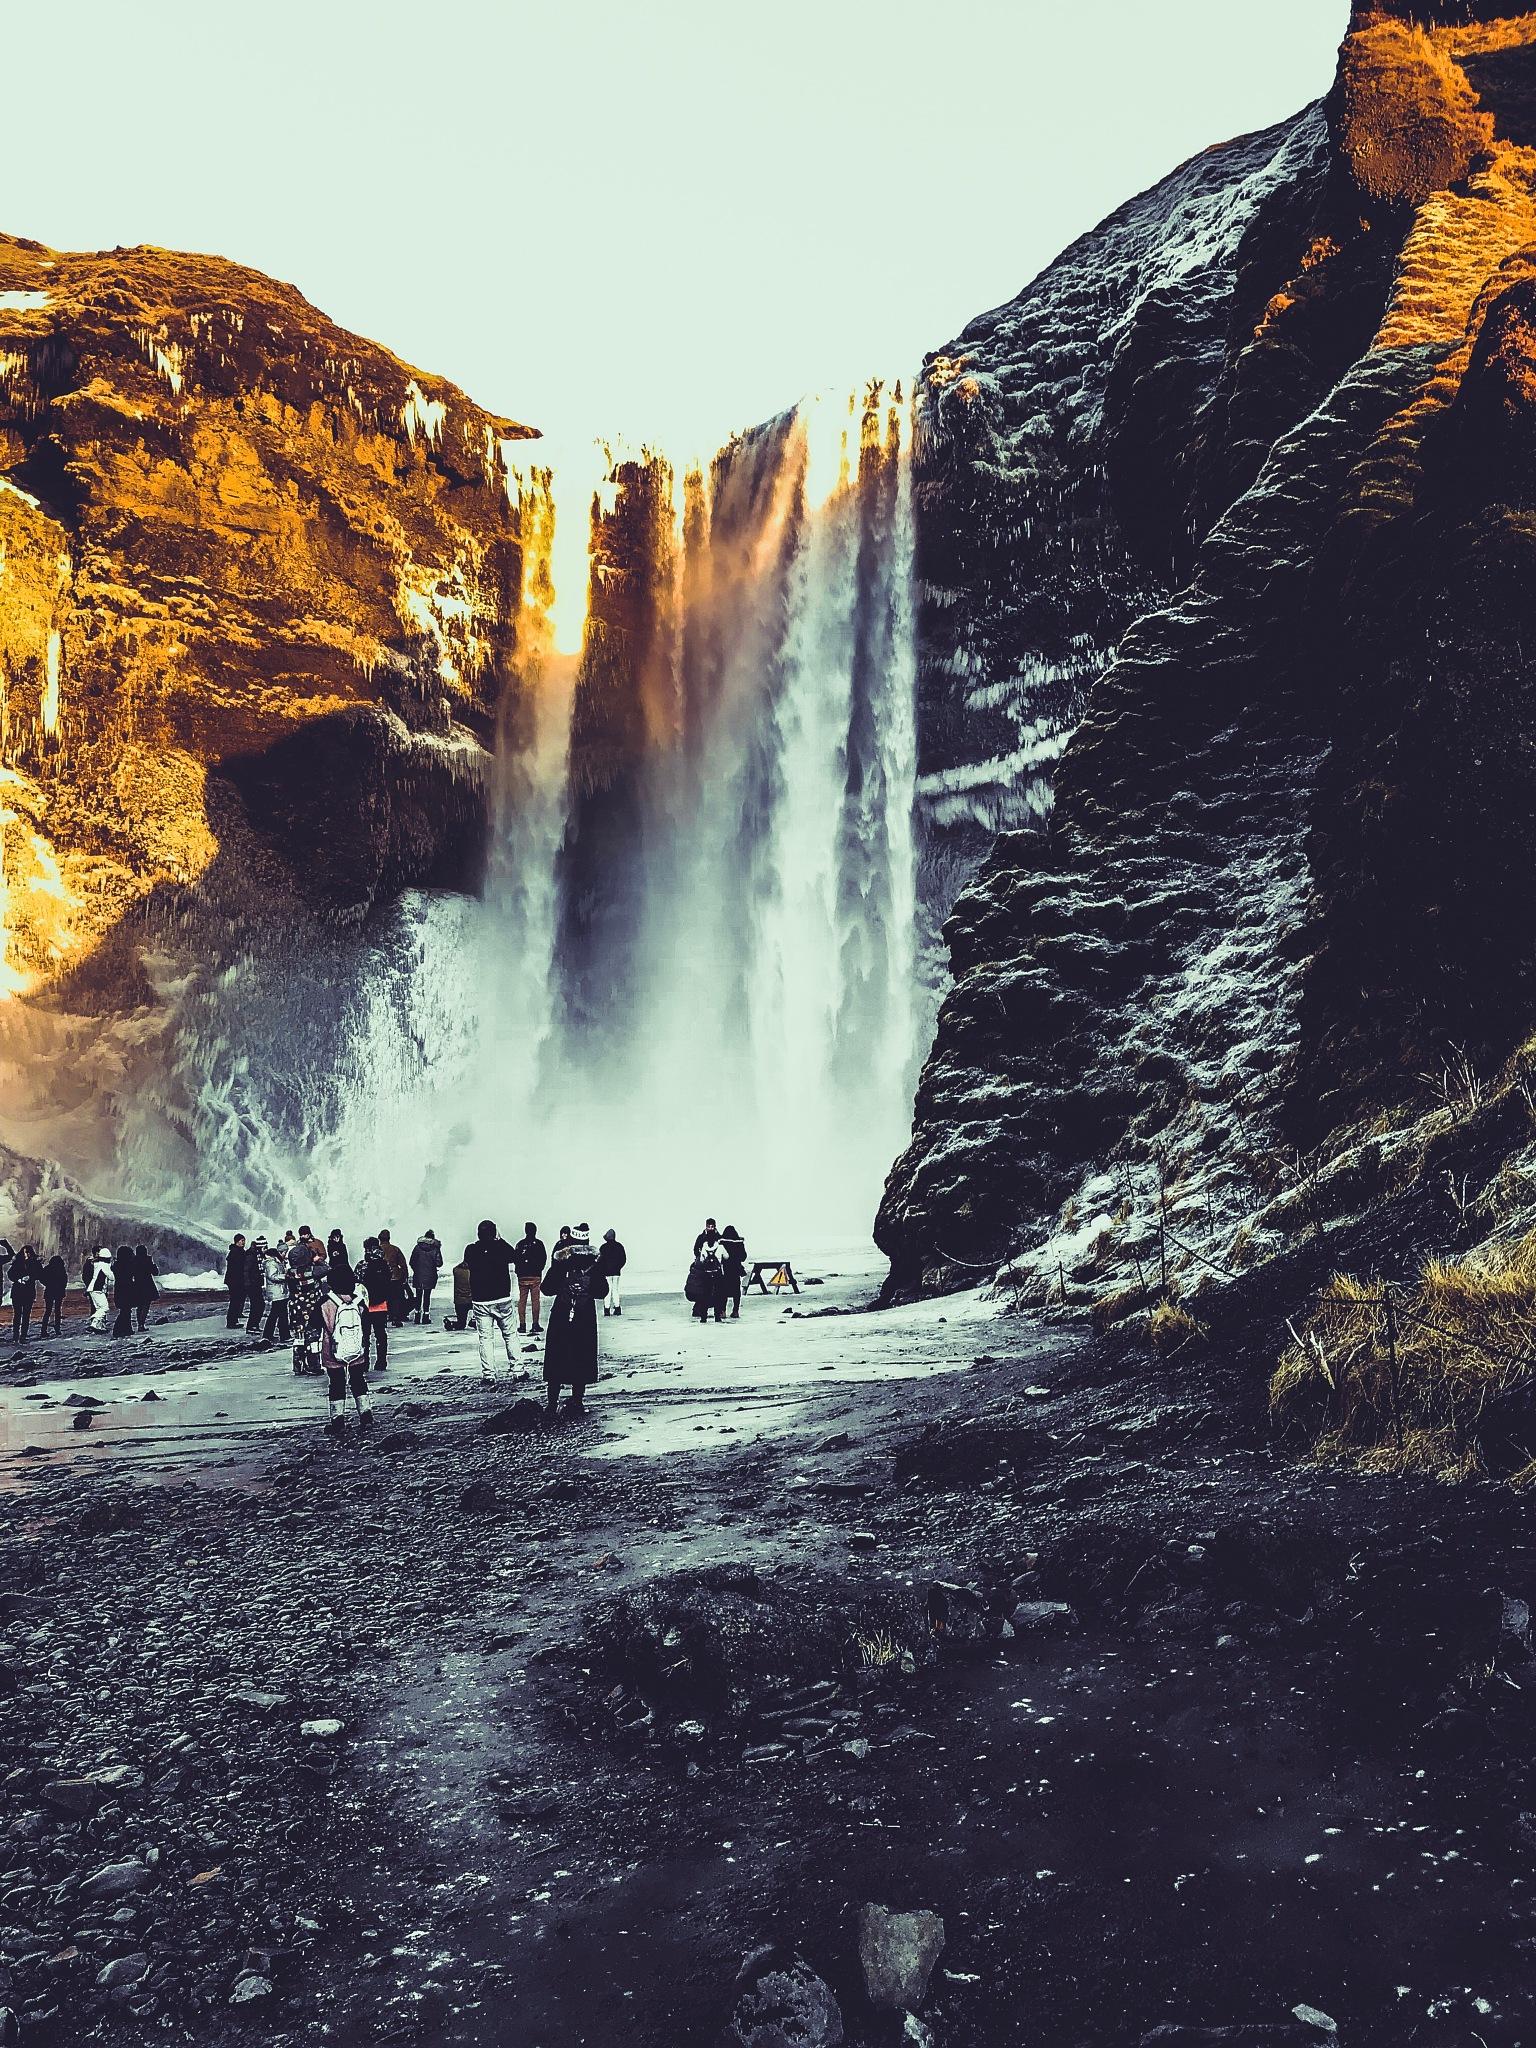 Just a big waterfall by Reece Watmough